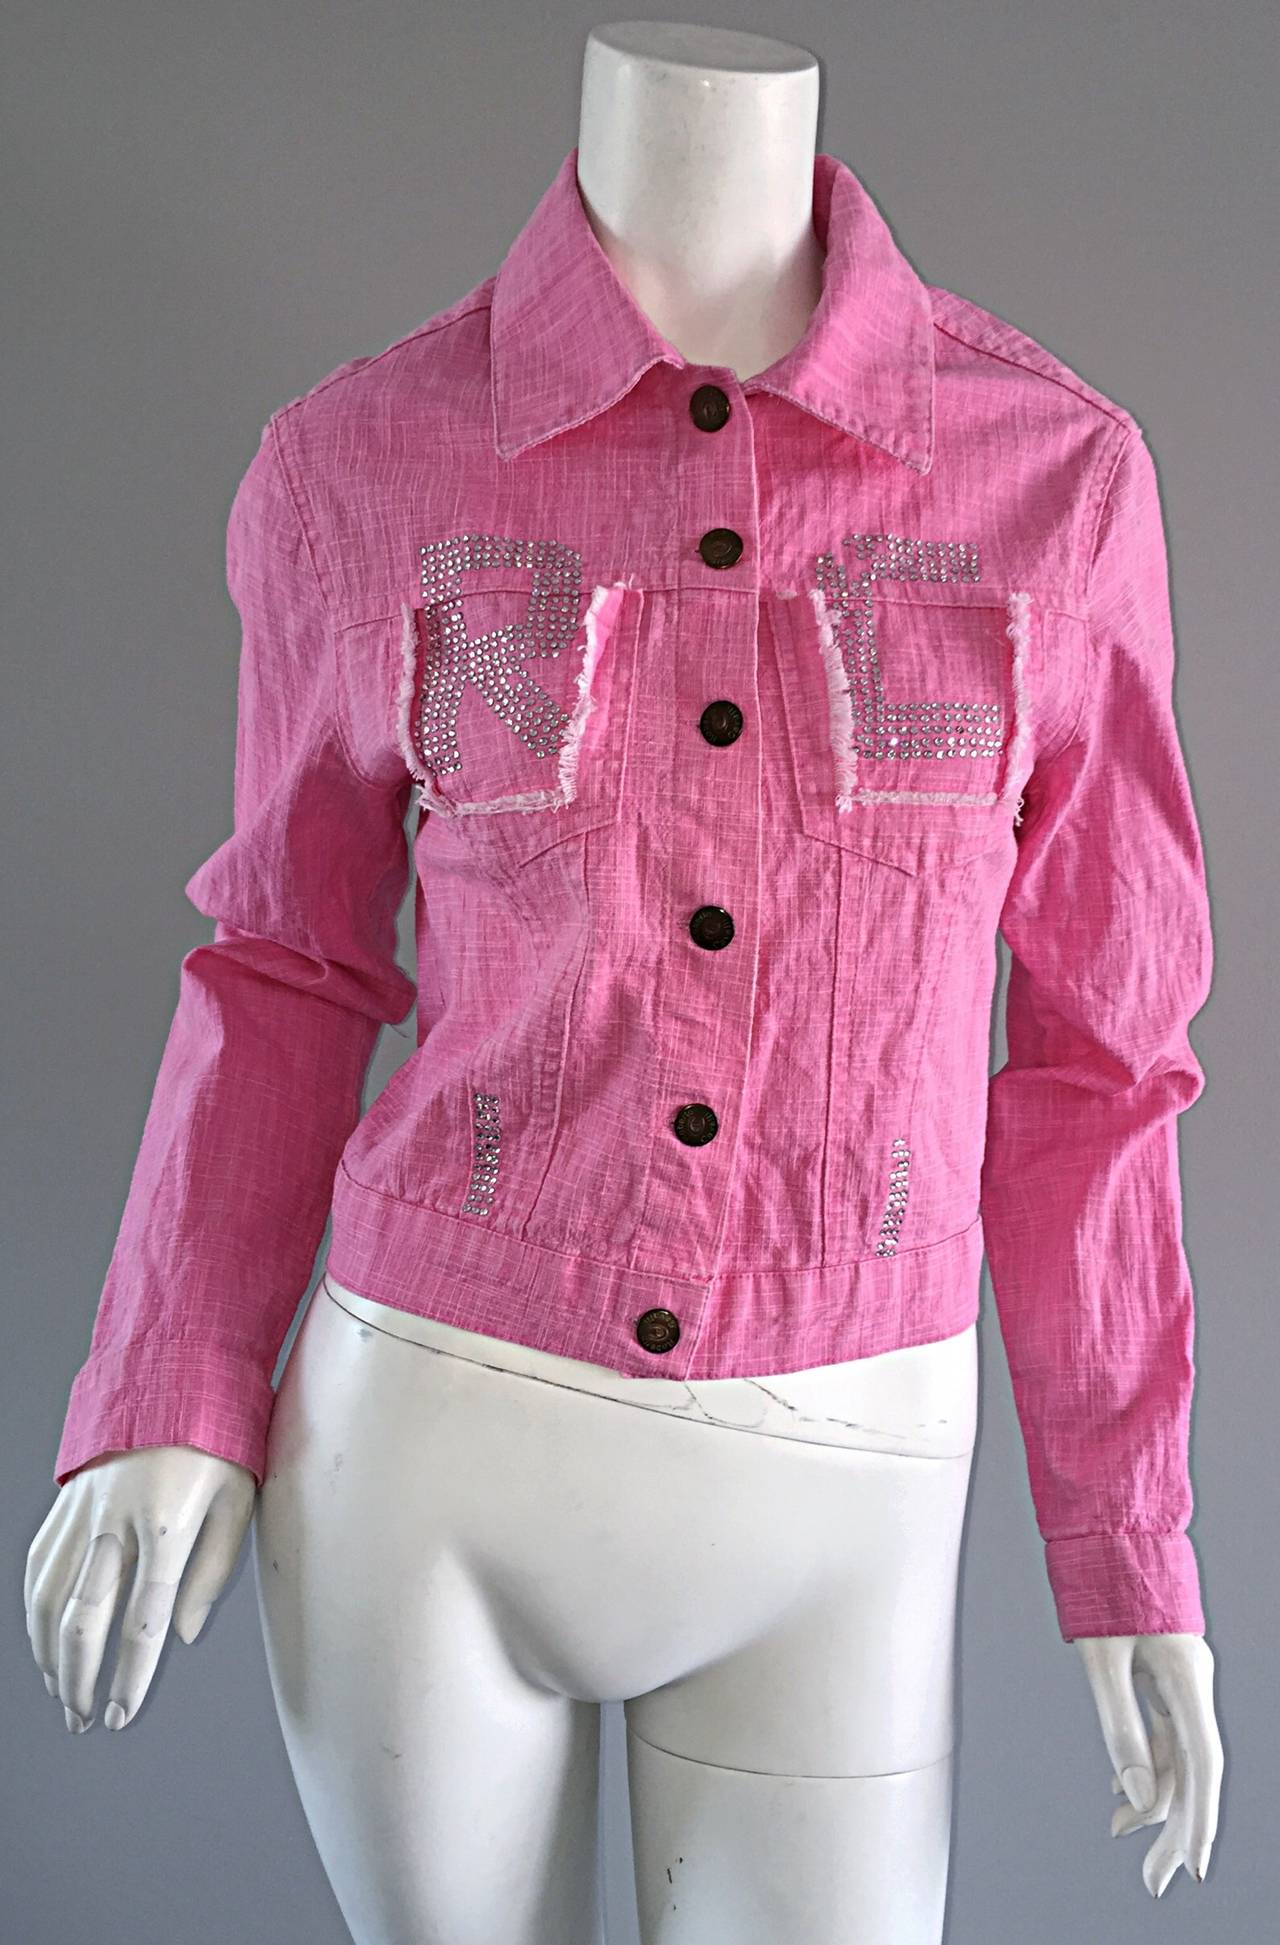 1990s Vintage Roberto Cavalli Pink Denim Jean Jacket + ' R C ' Rhinestones 6